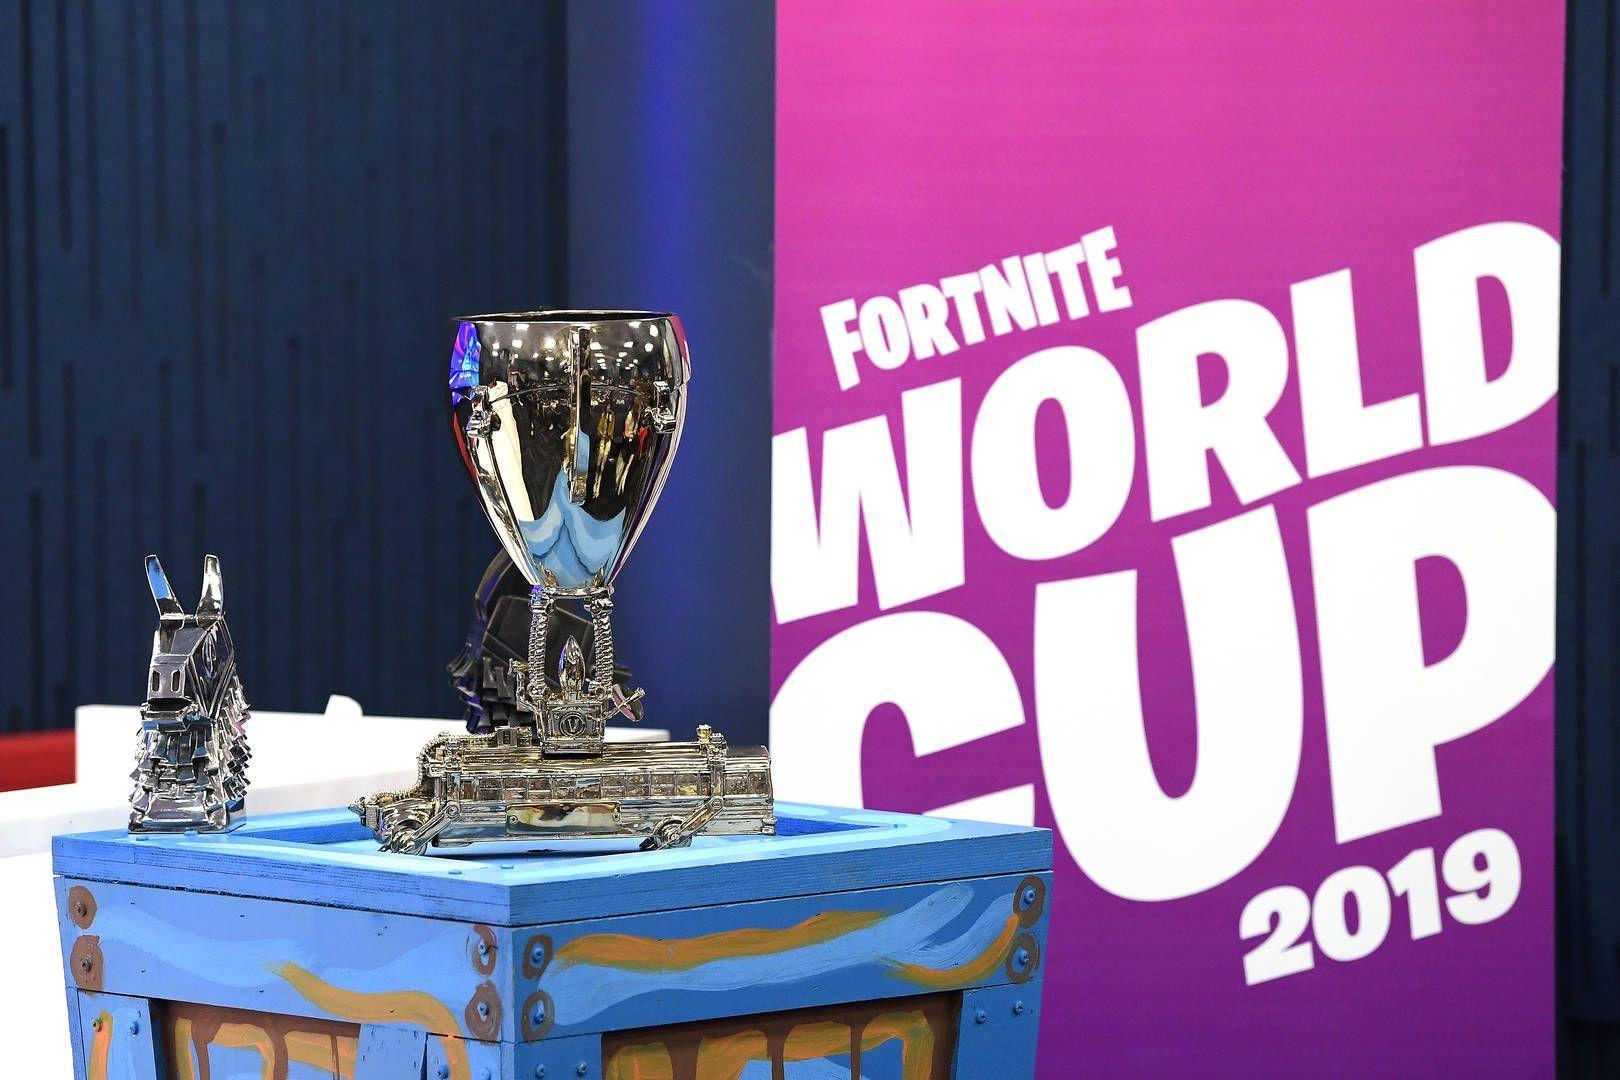 500 Fortnite Ideas In 2020 Fortnite Epic Games Fortnite Epic Games